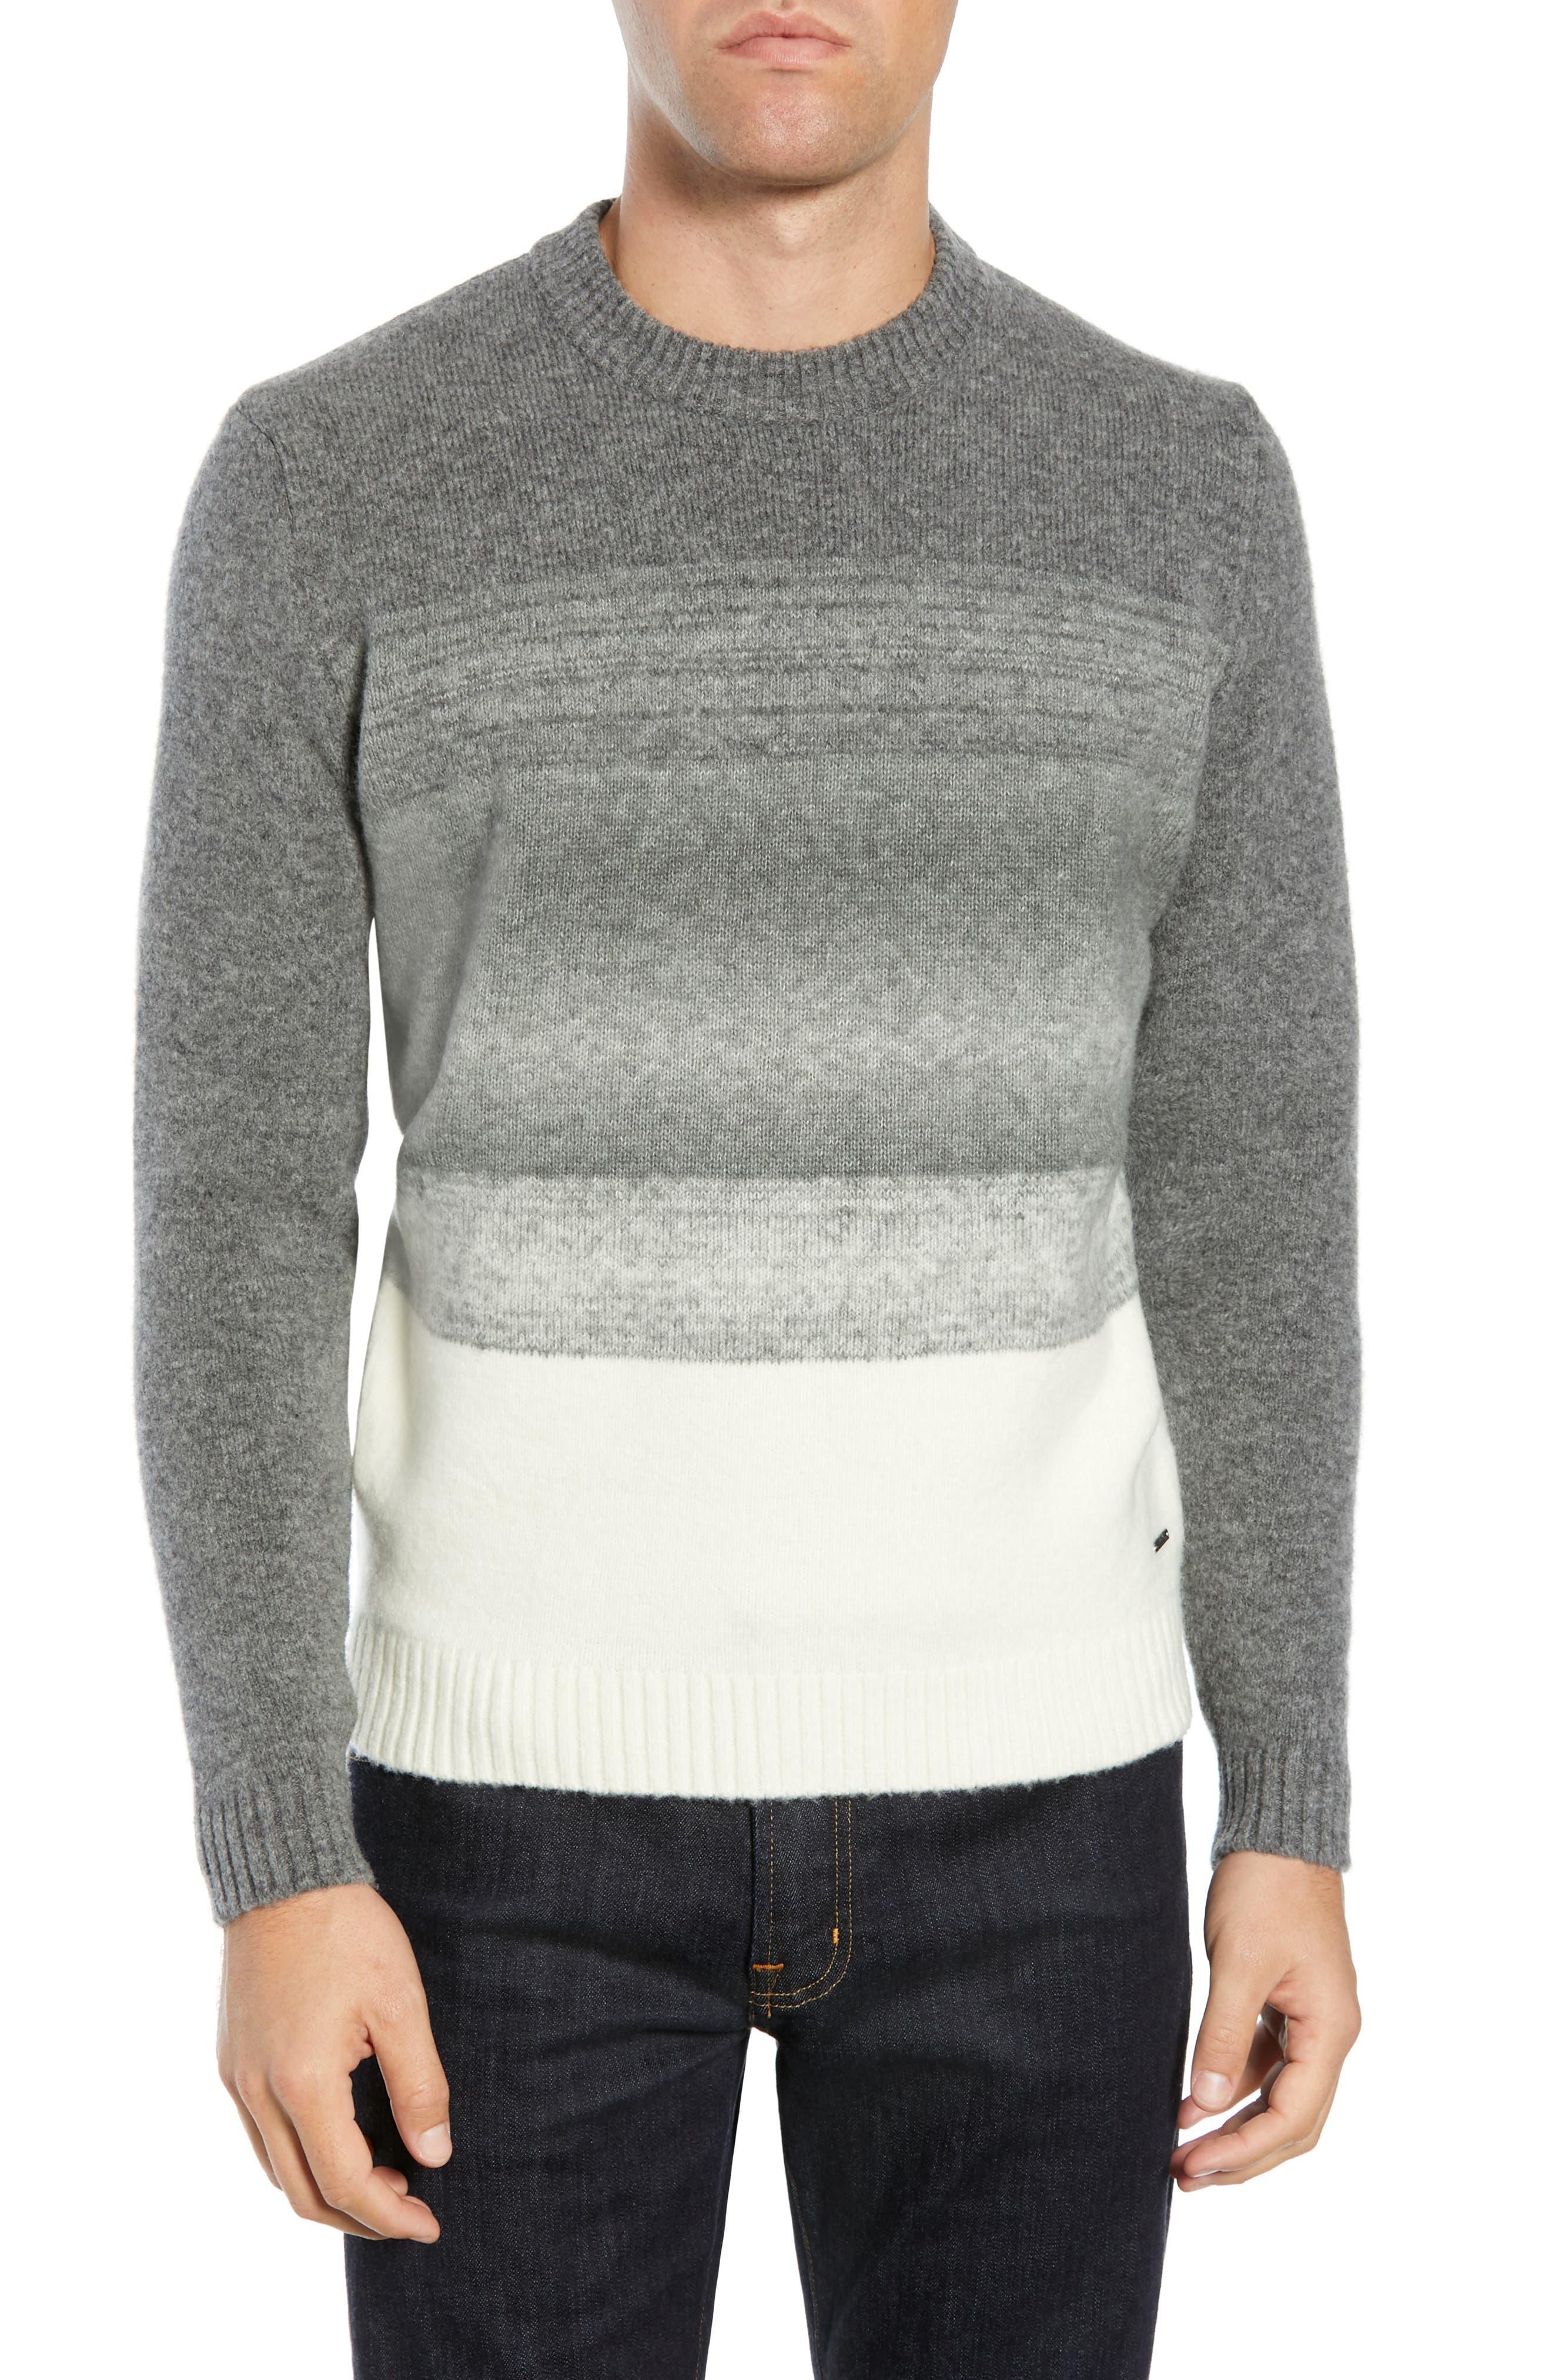 Ecardo Dégradé Virgin Wool Blend Sweater,                             Main thumbnail 1, color,                             GREY